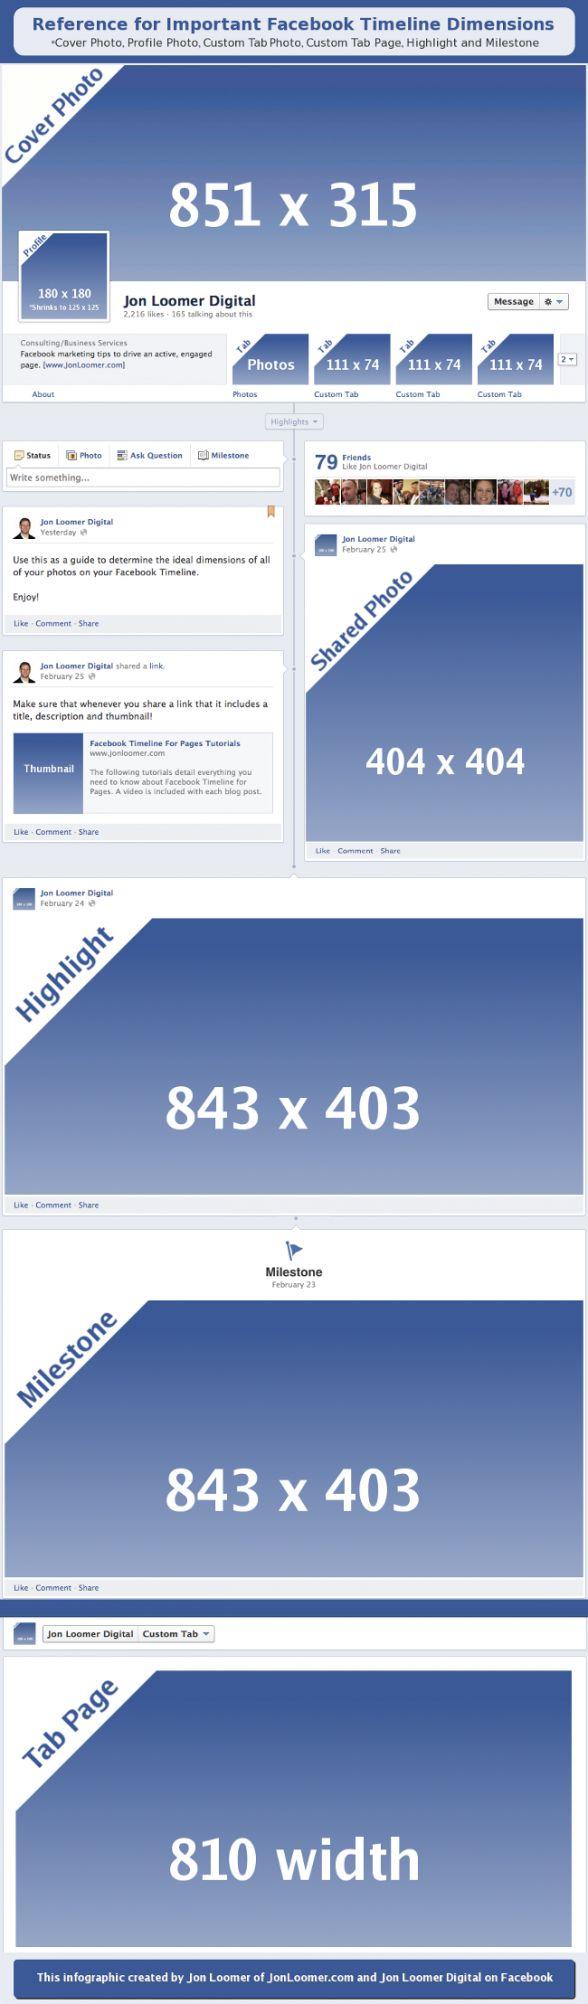 Facebooktimelineimagedimensions